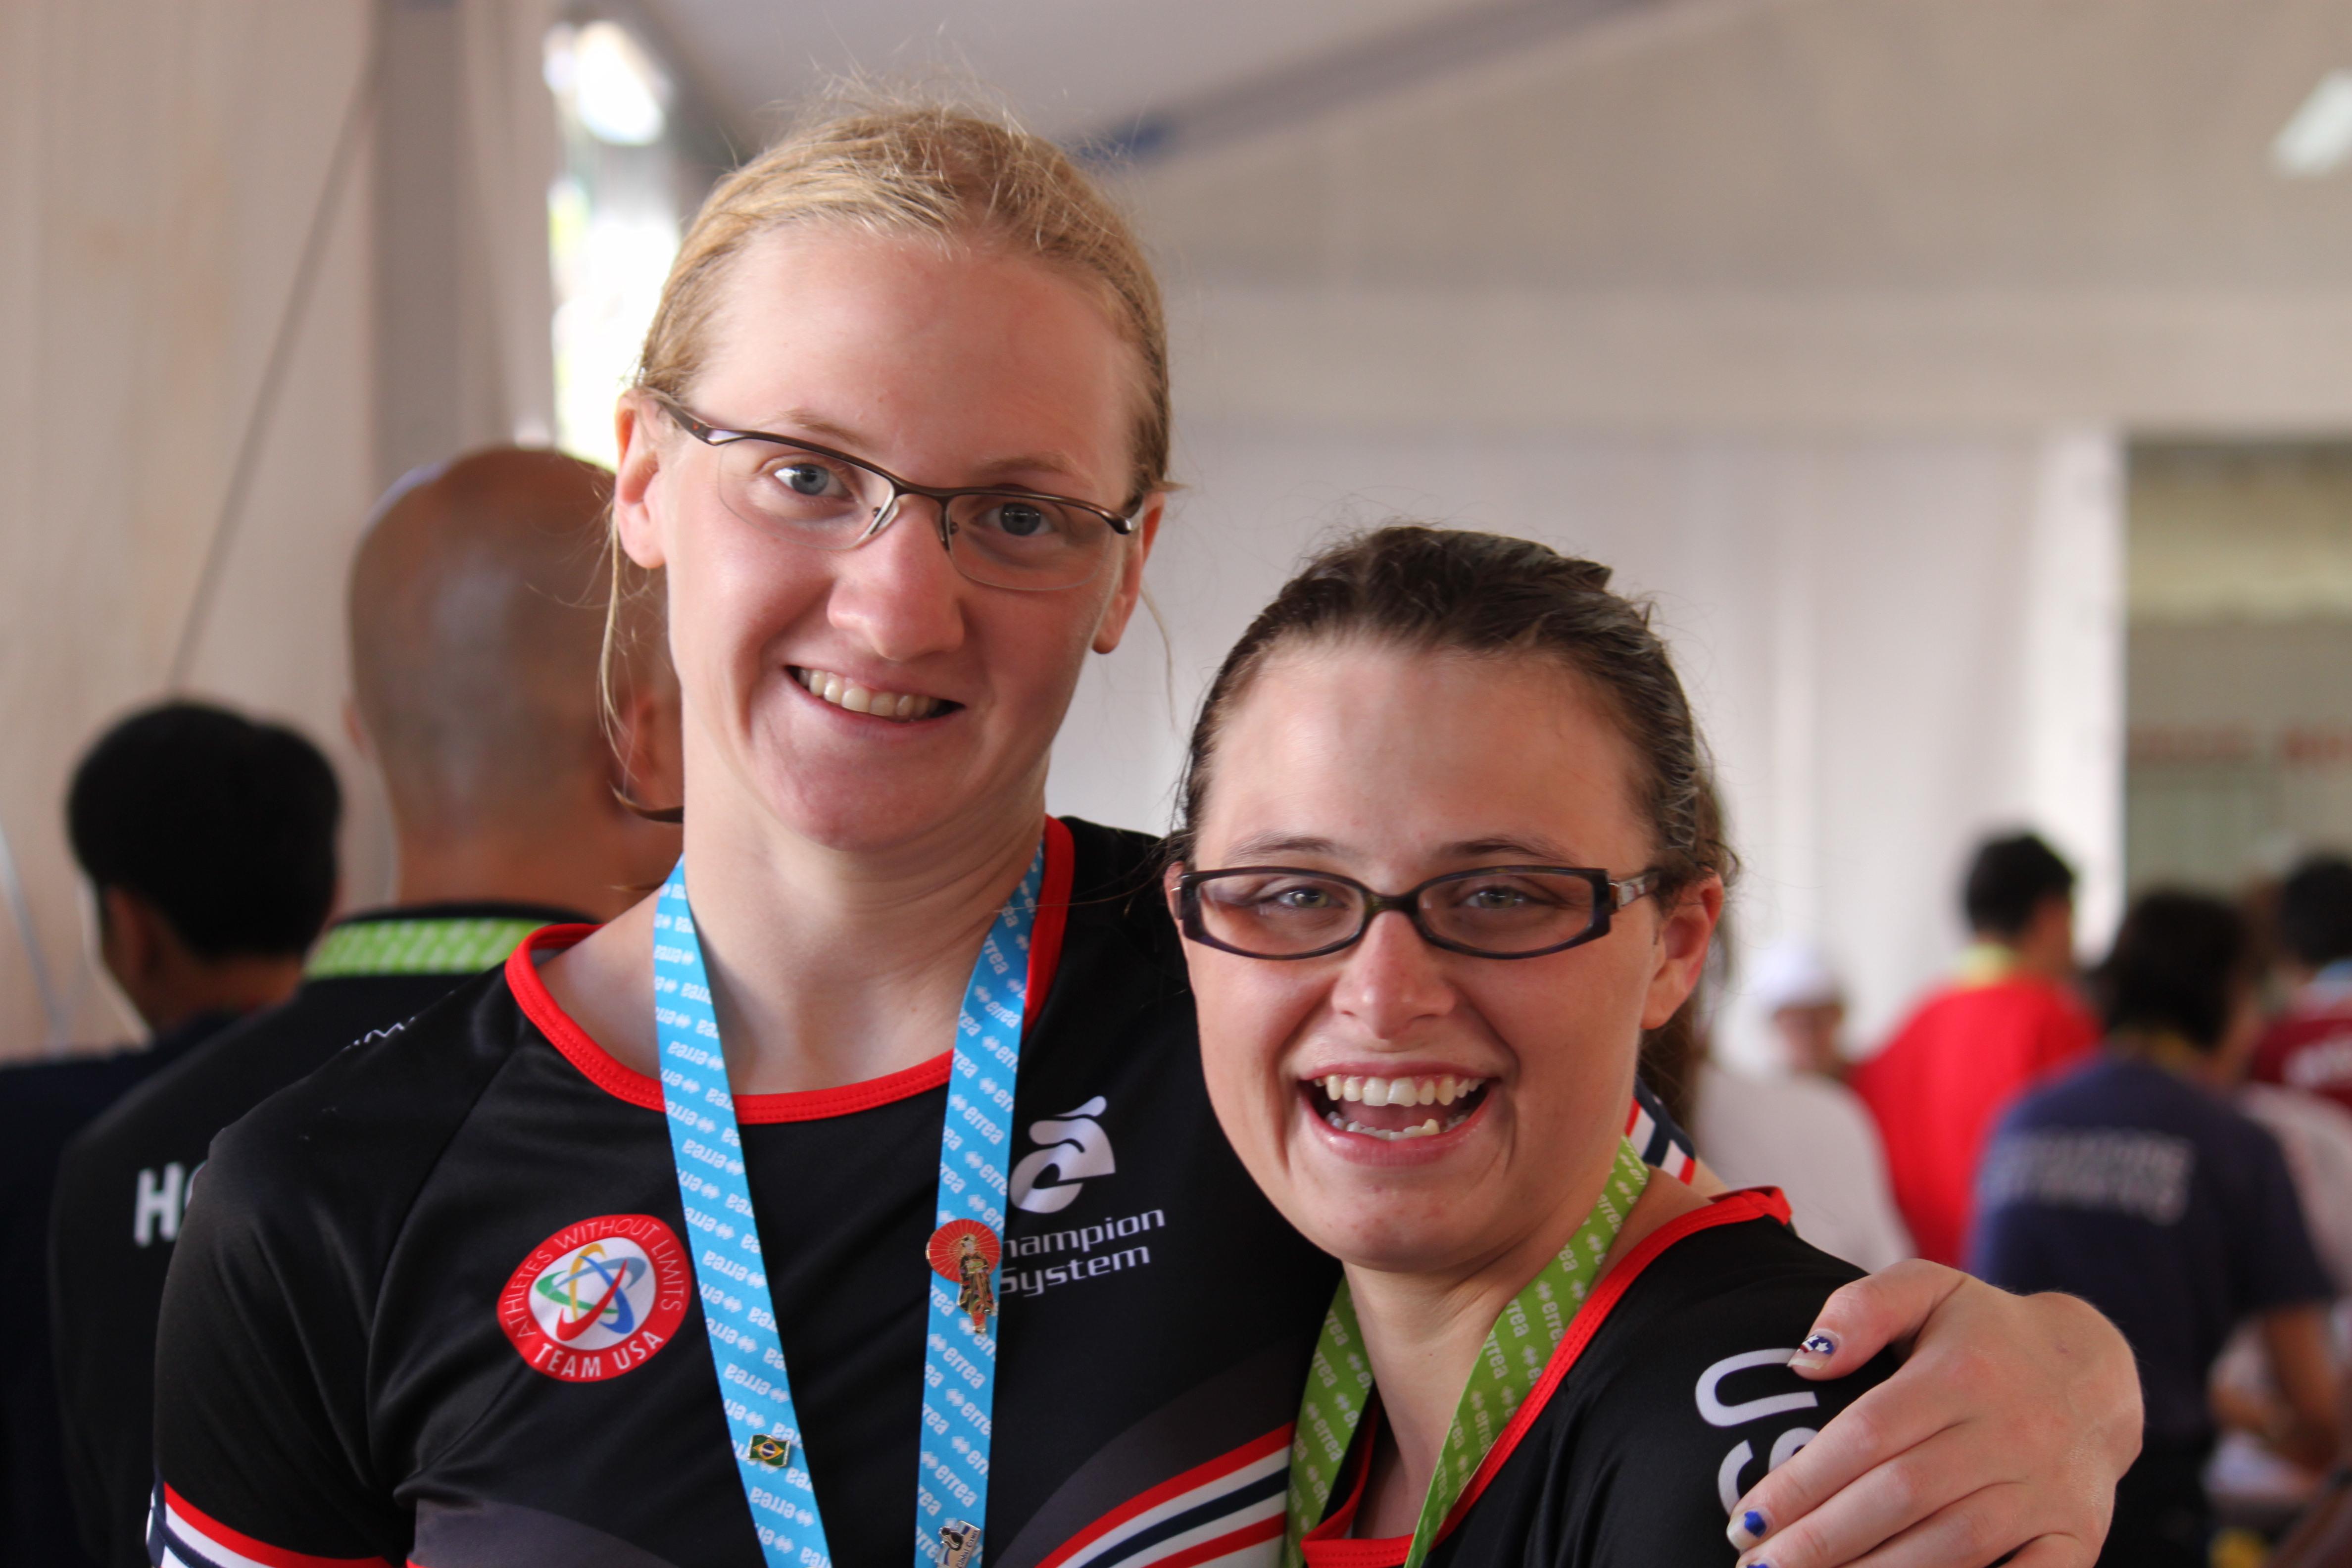 Leslie Cichocki & Sarah Gilbert